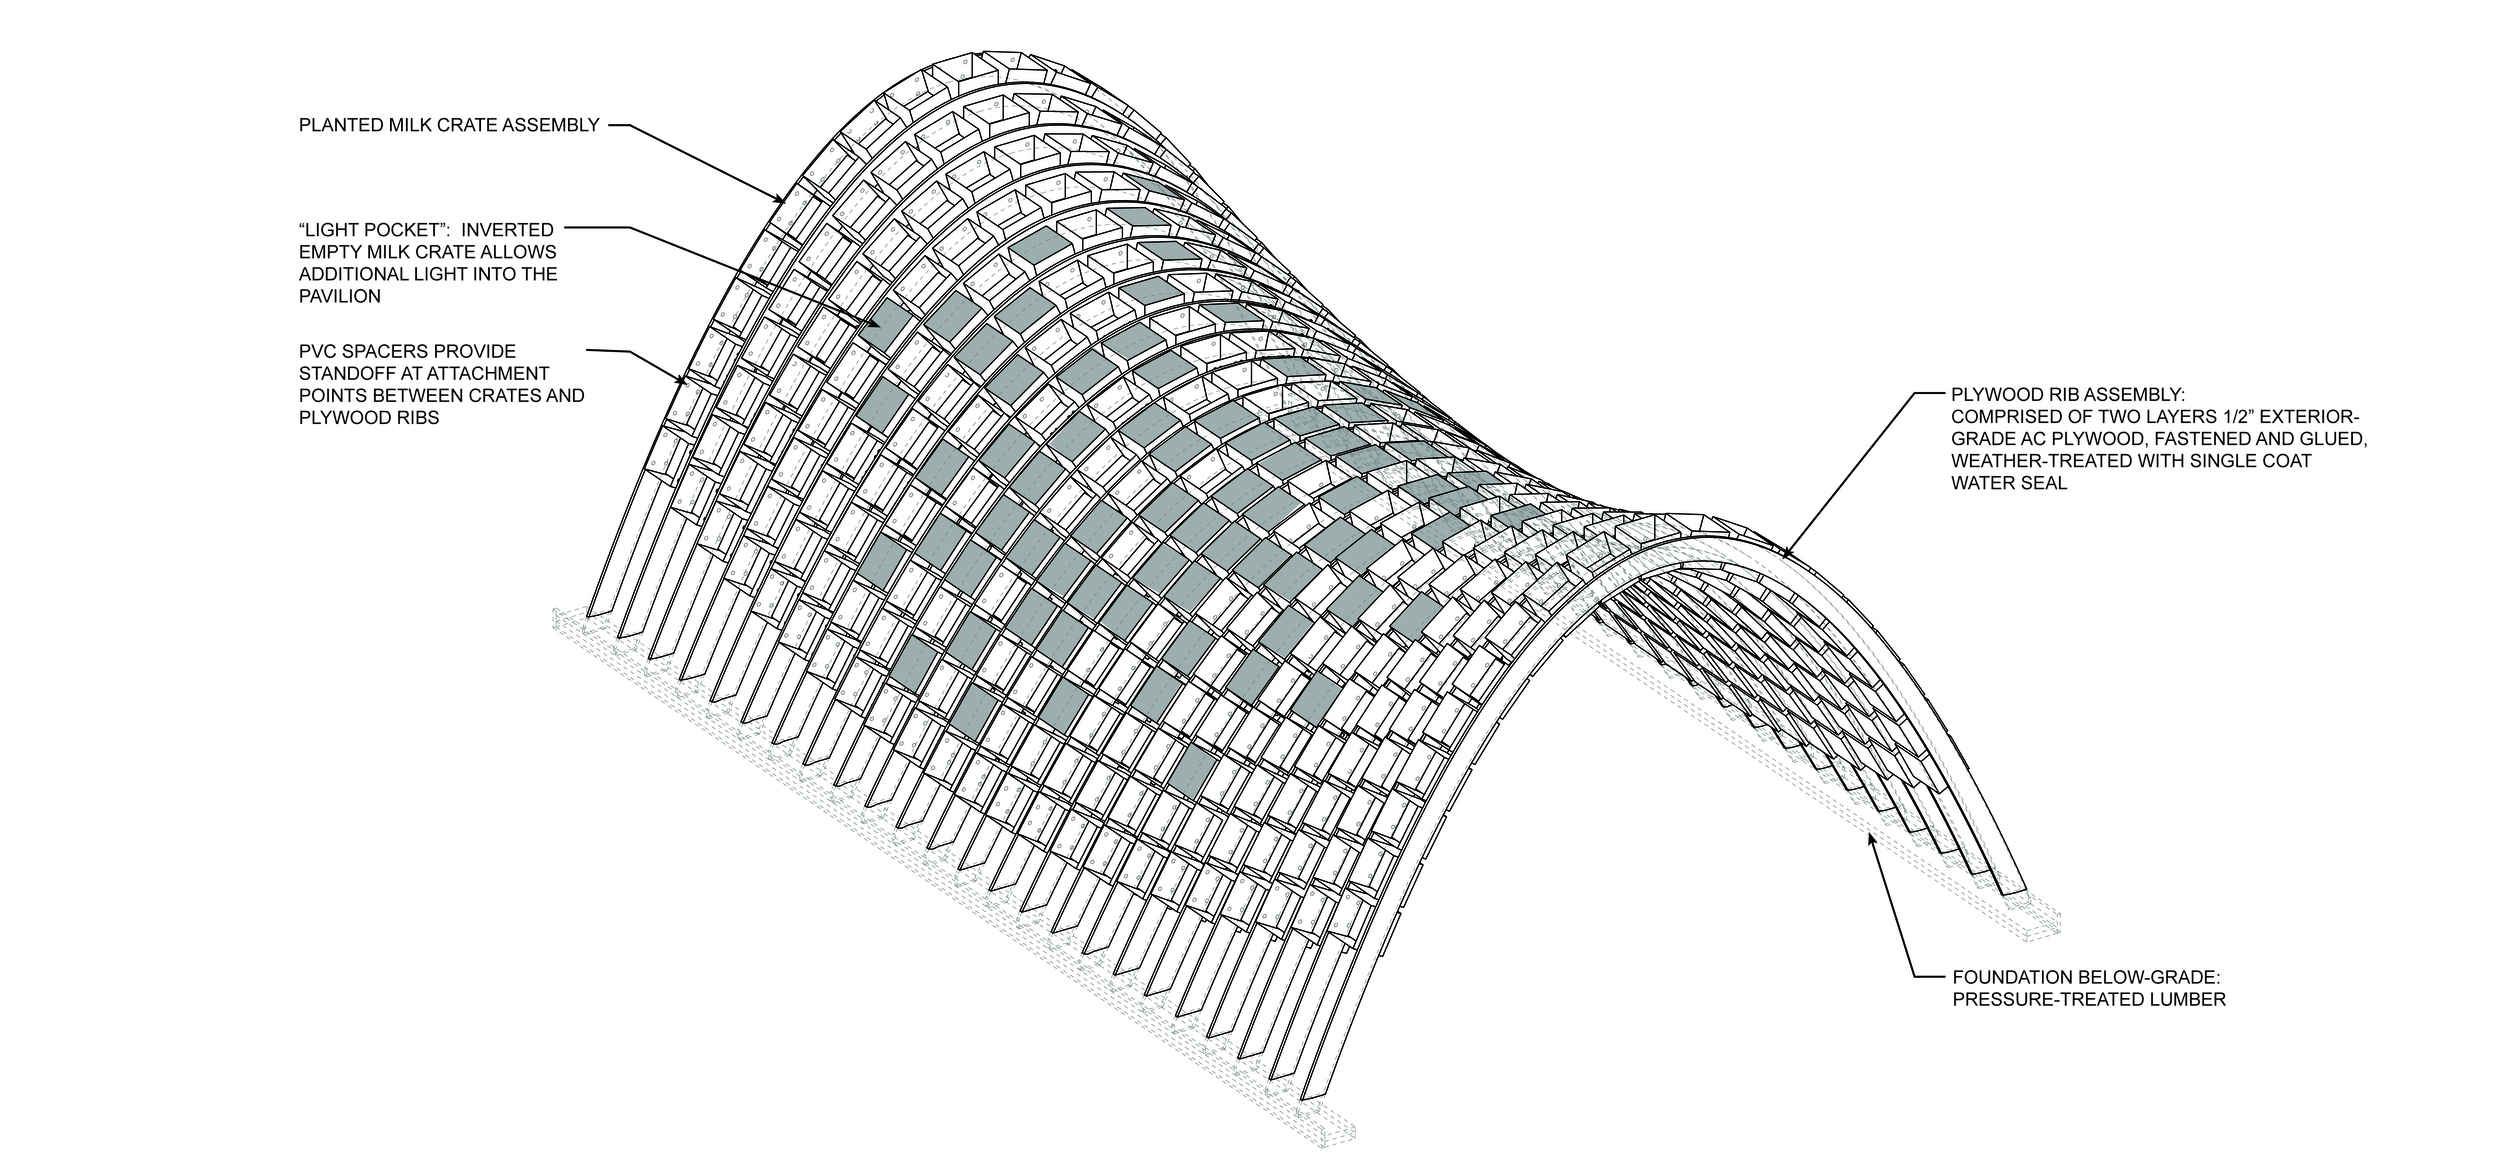 axonometric_diagram.jpg